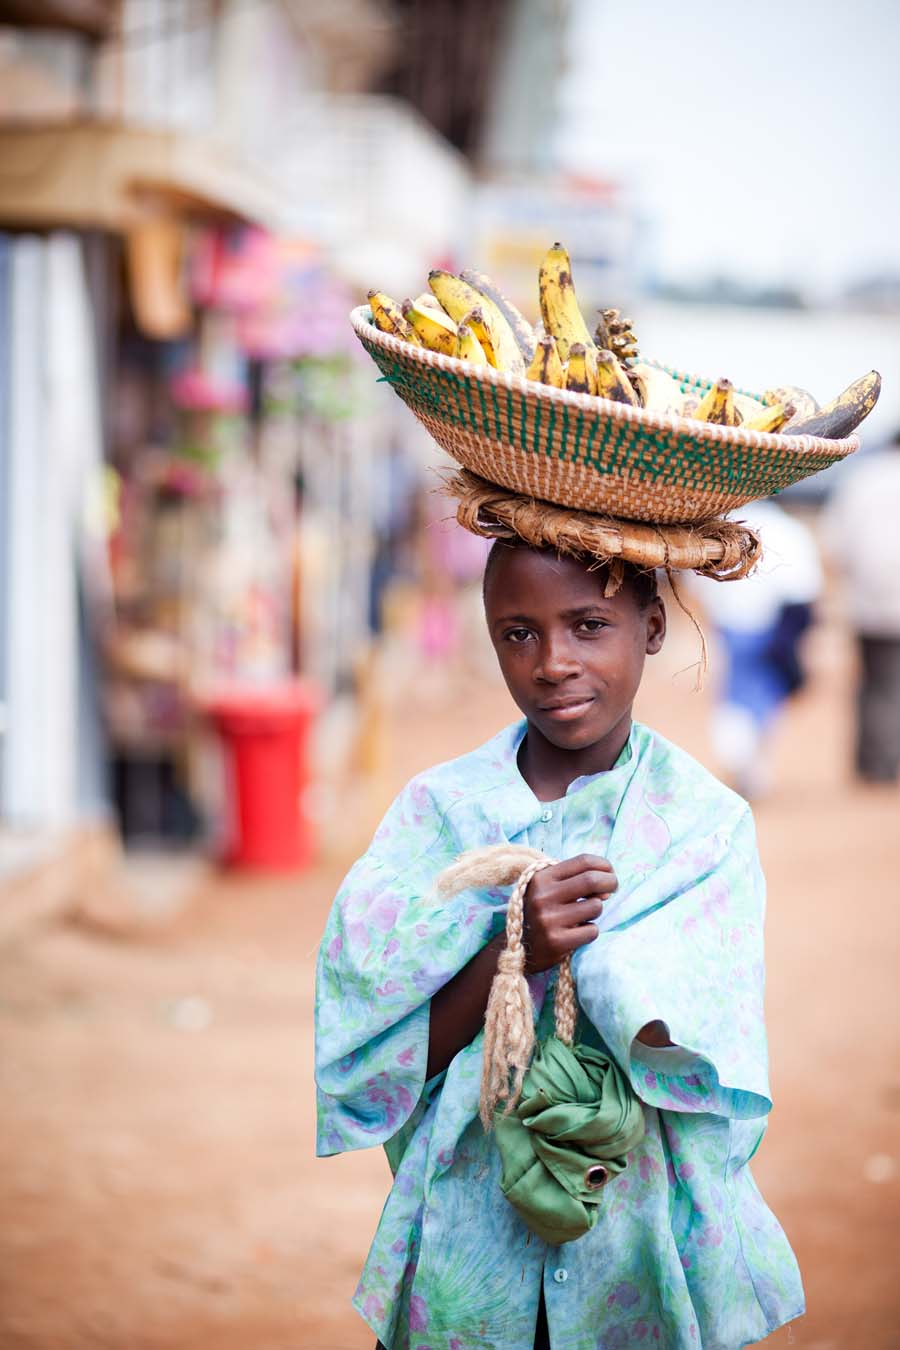 jessicadavisphotography.com | Jessica Davis Photography | Portrait Work in Uganda| Travel Photographer | World Event Photographs 3 (6).jpg